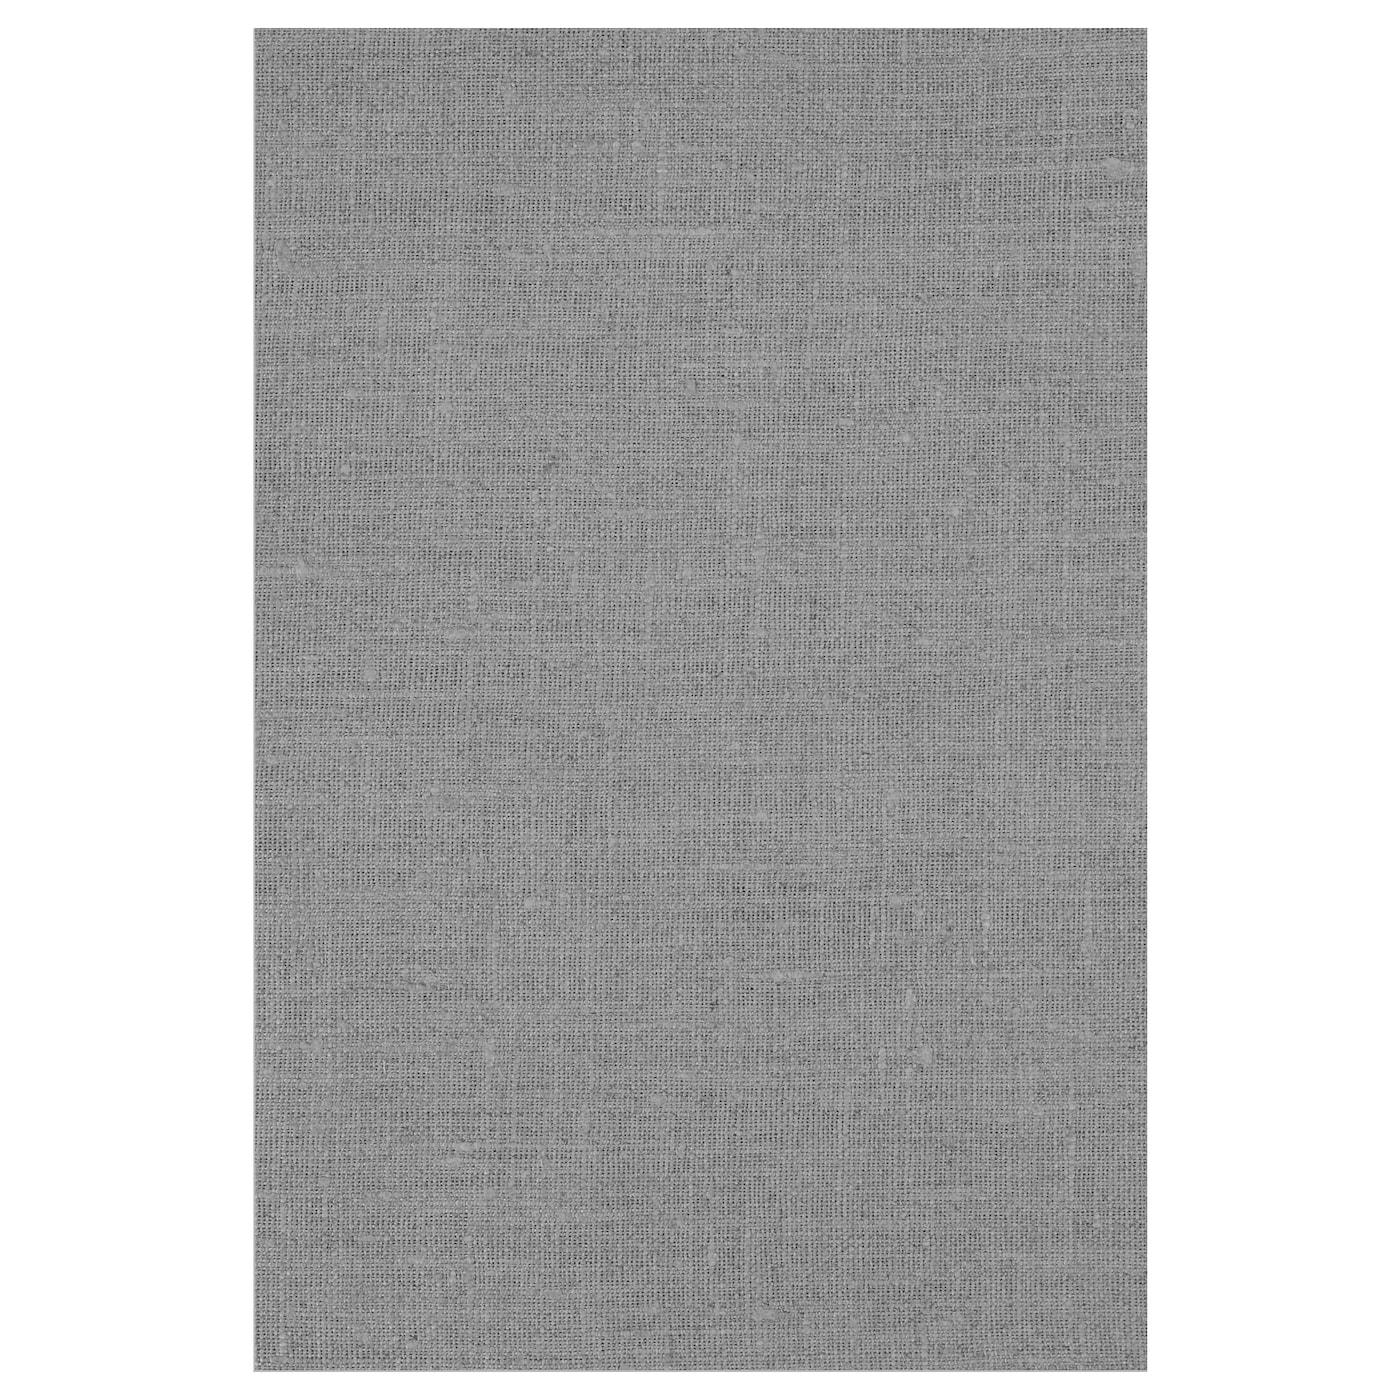 AINA Fabric Grey 150 Cm